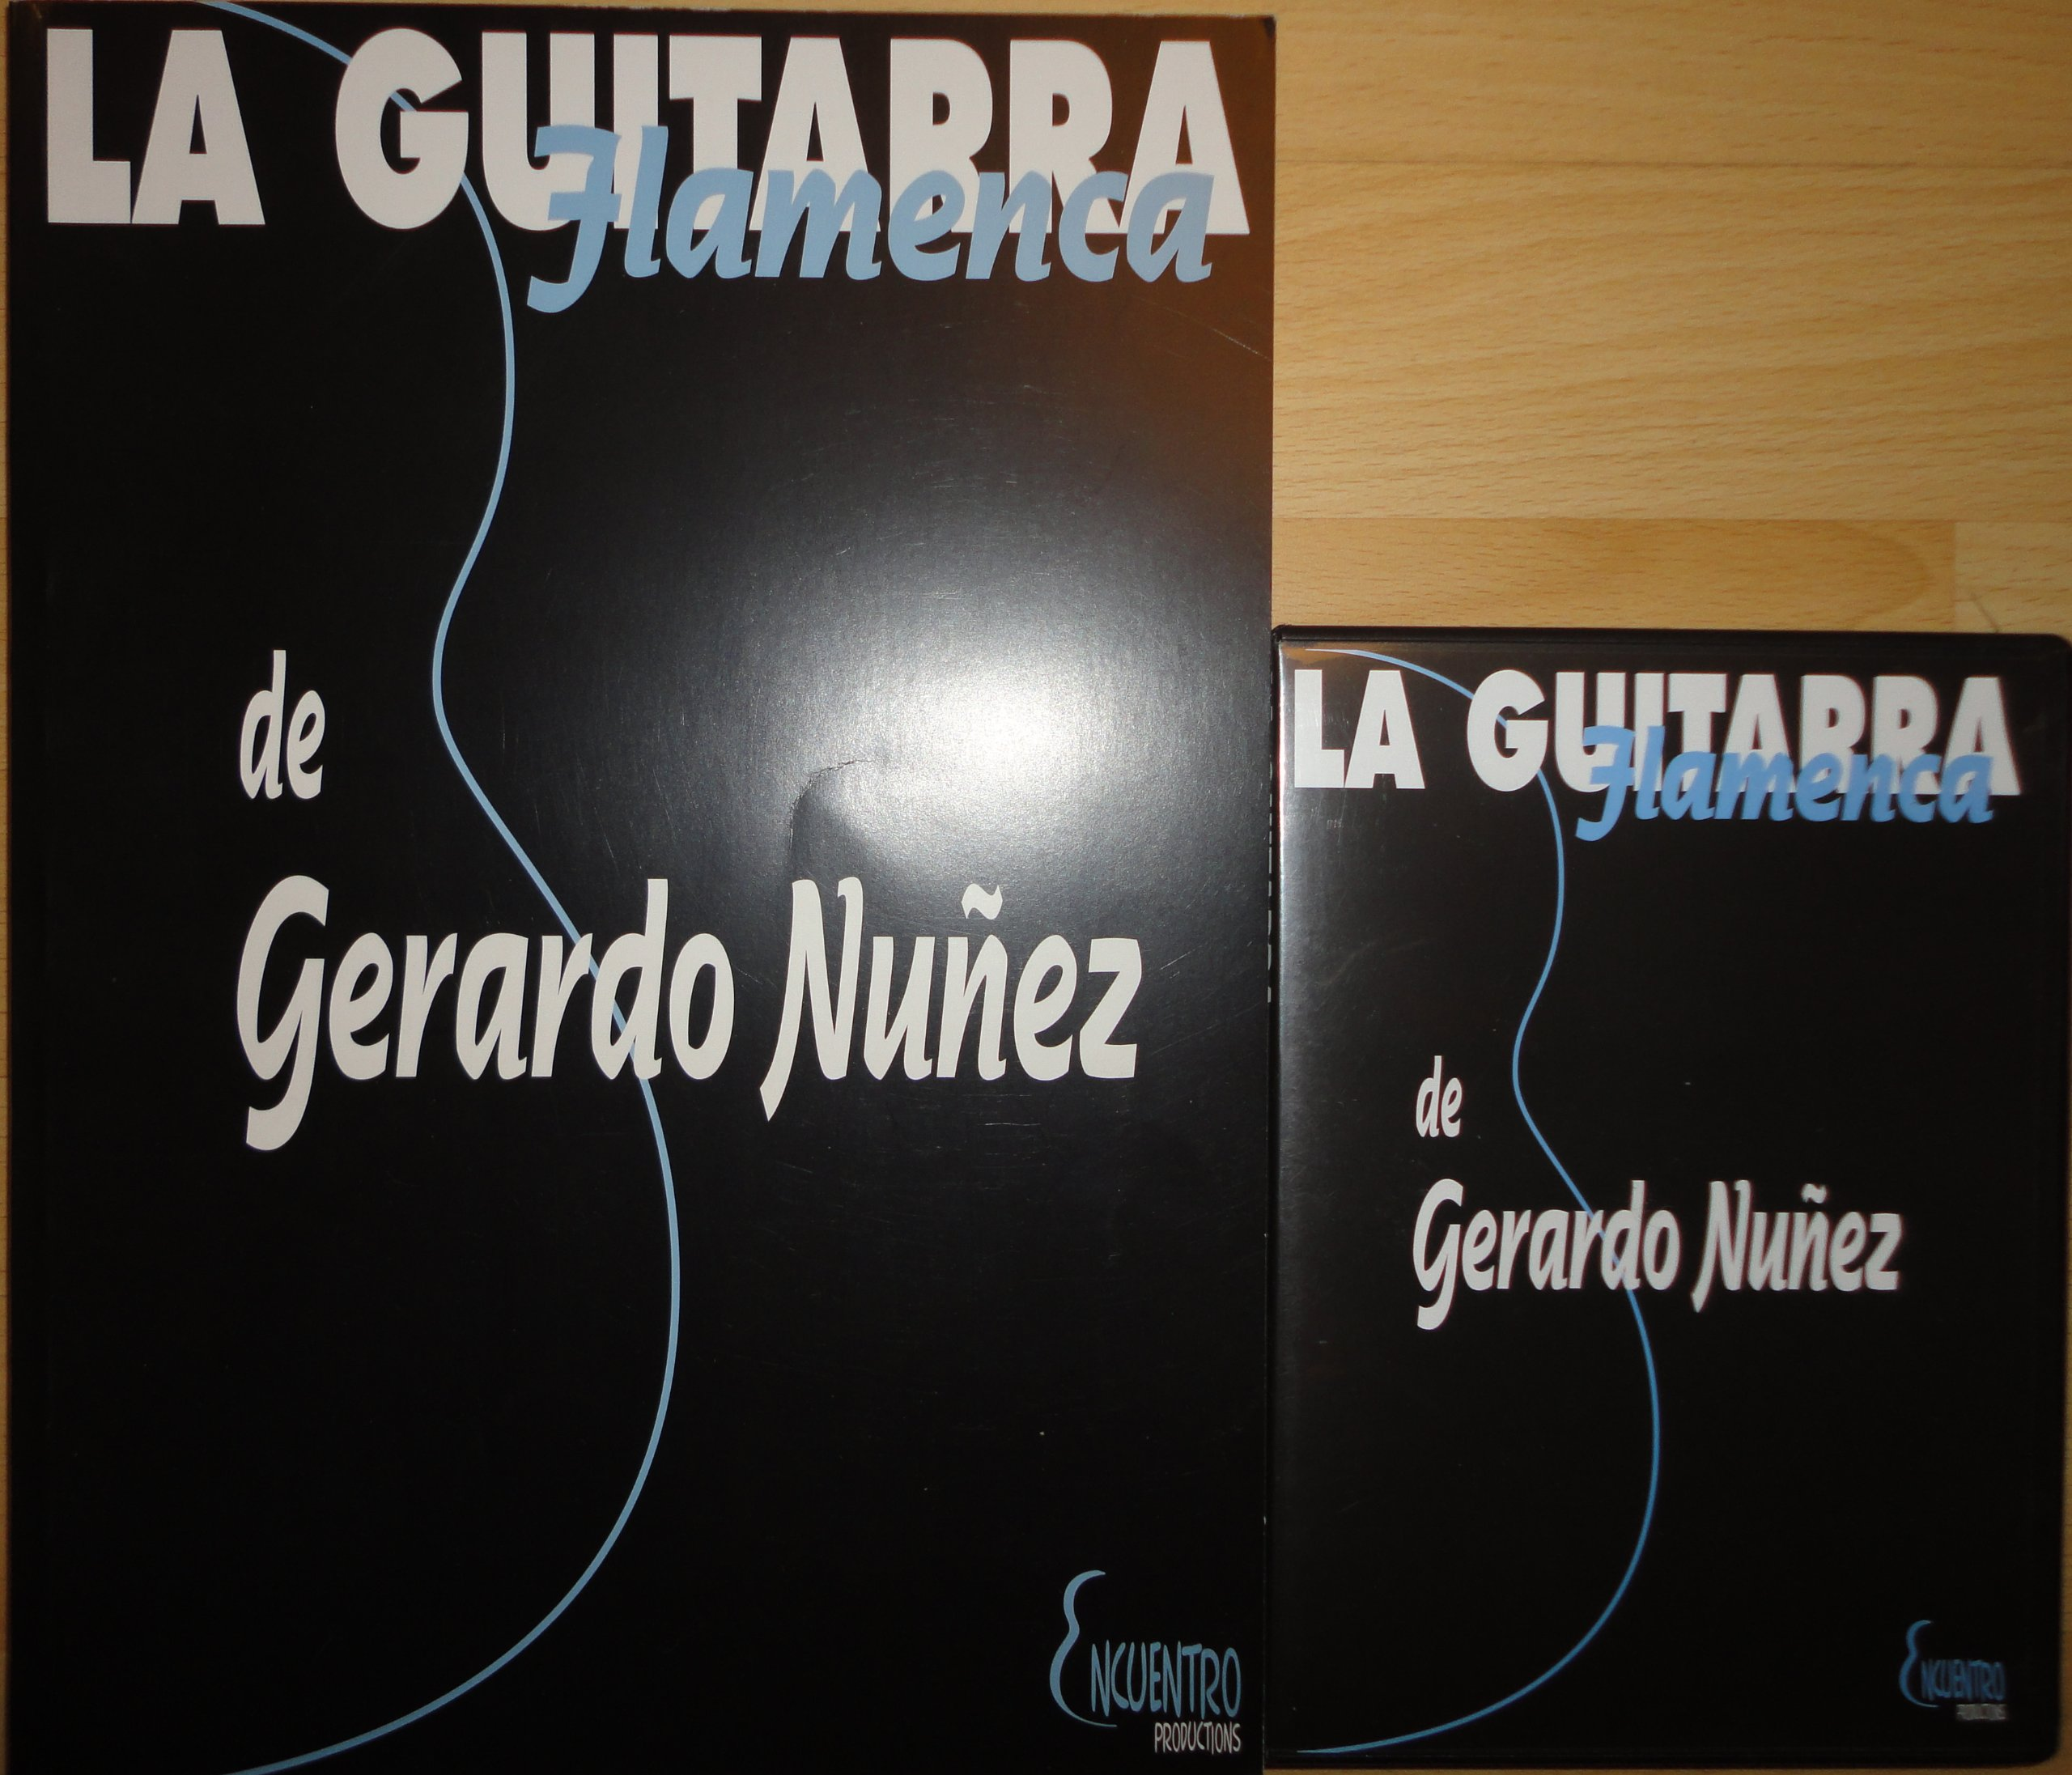 La guitarra flamenca de Gerardo Nuñez Libro/DVD flamencolive.com ...